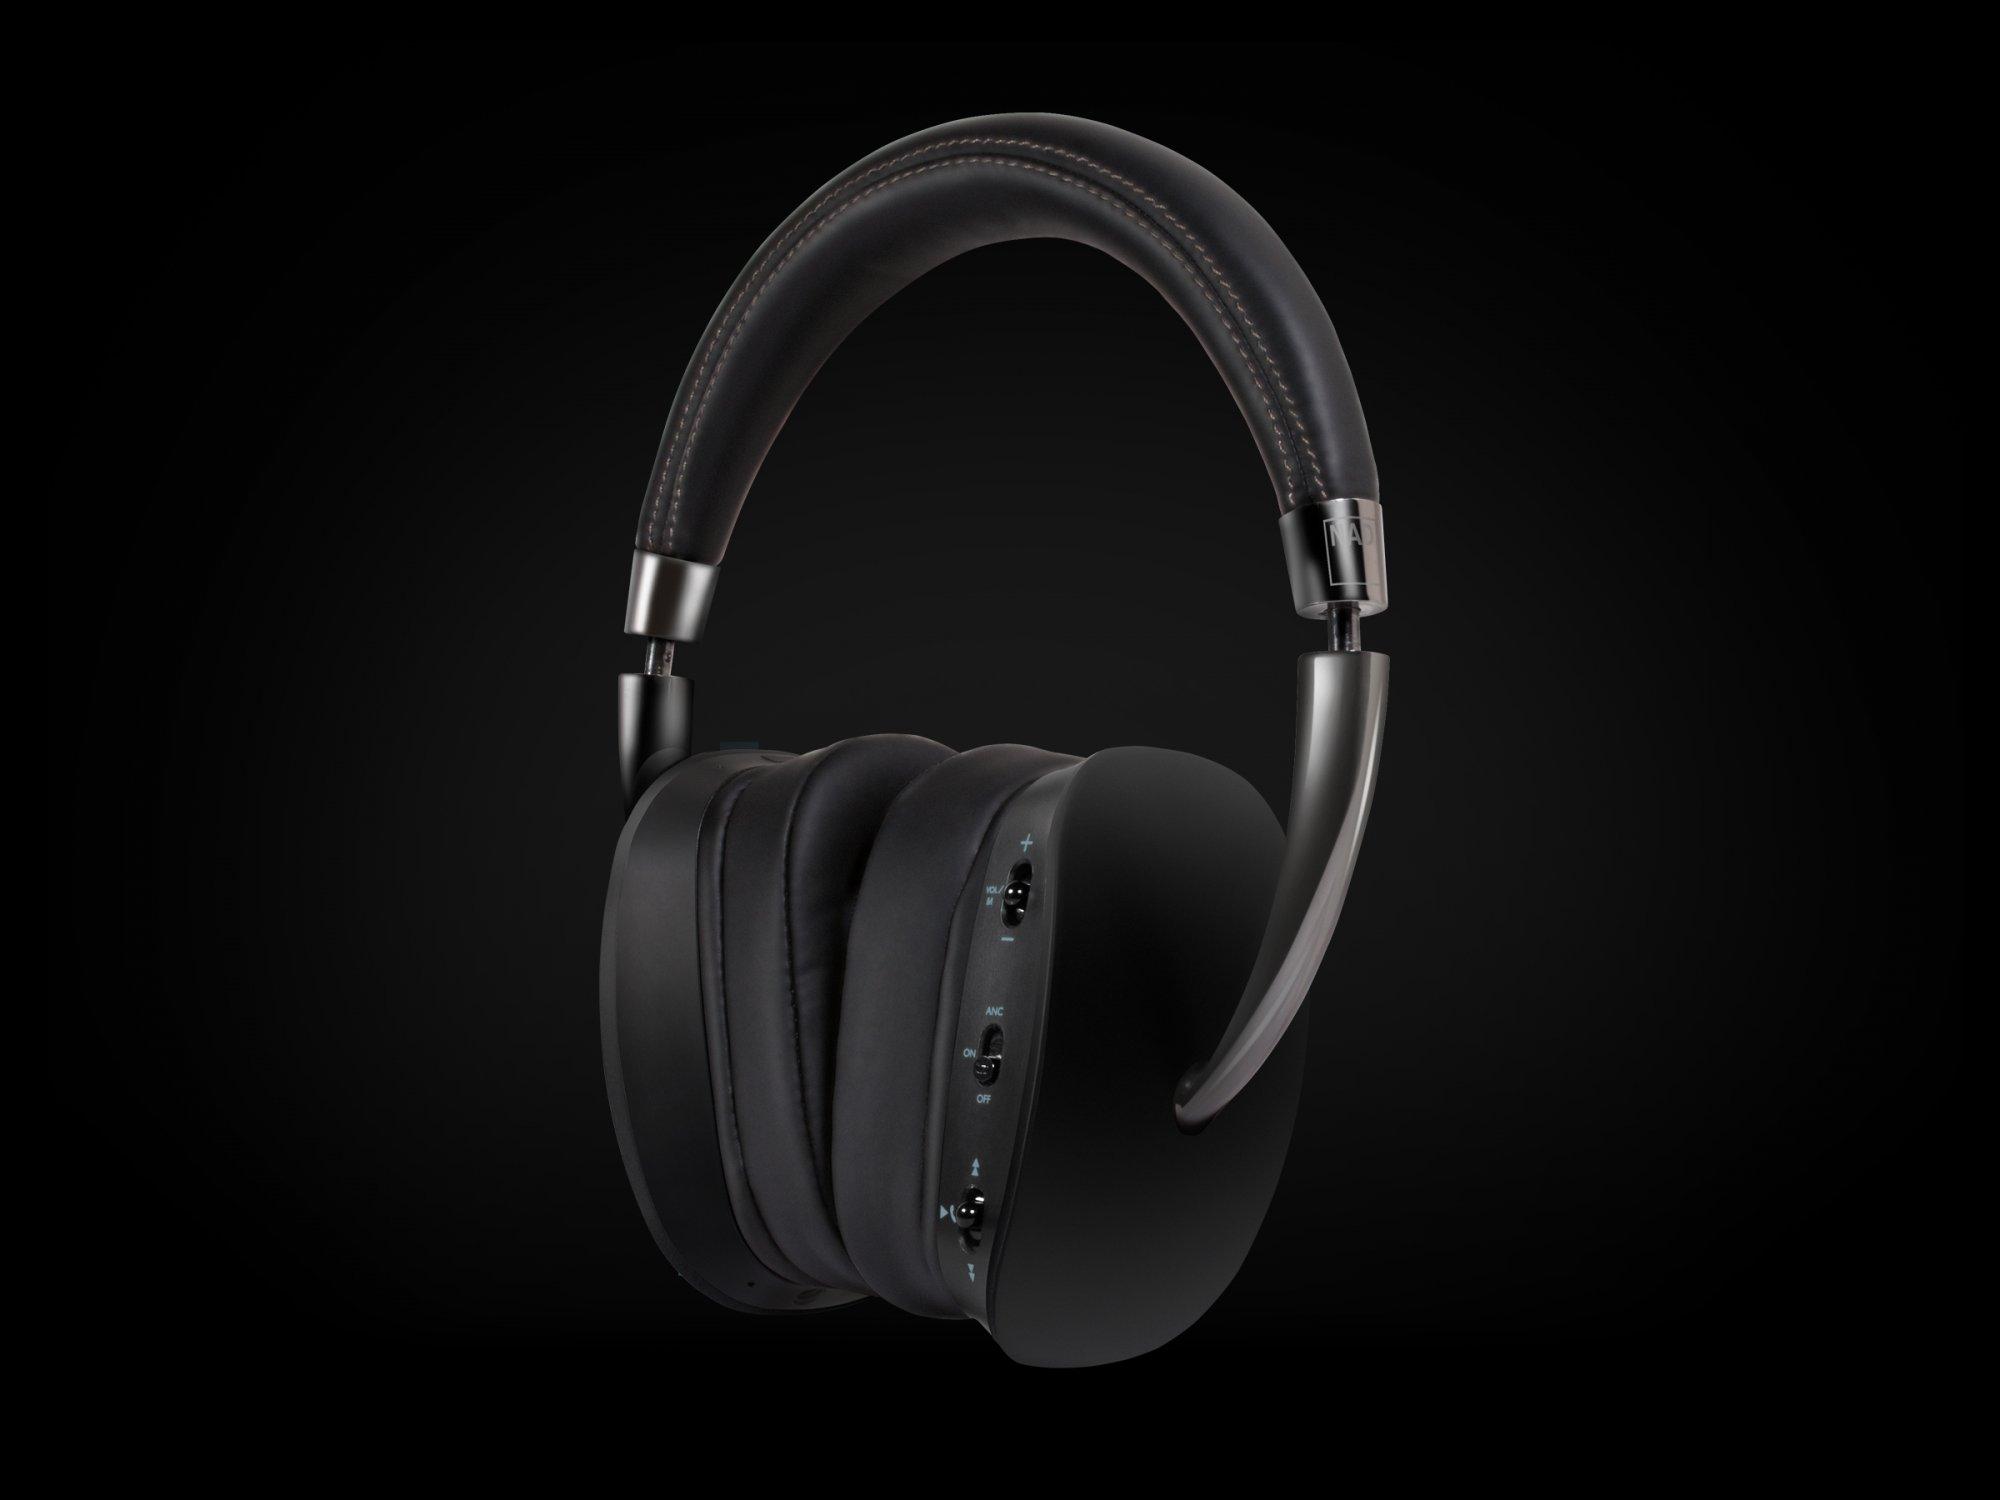 NAD HP70 Wireless ANC Headphone featuring RoomFeel